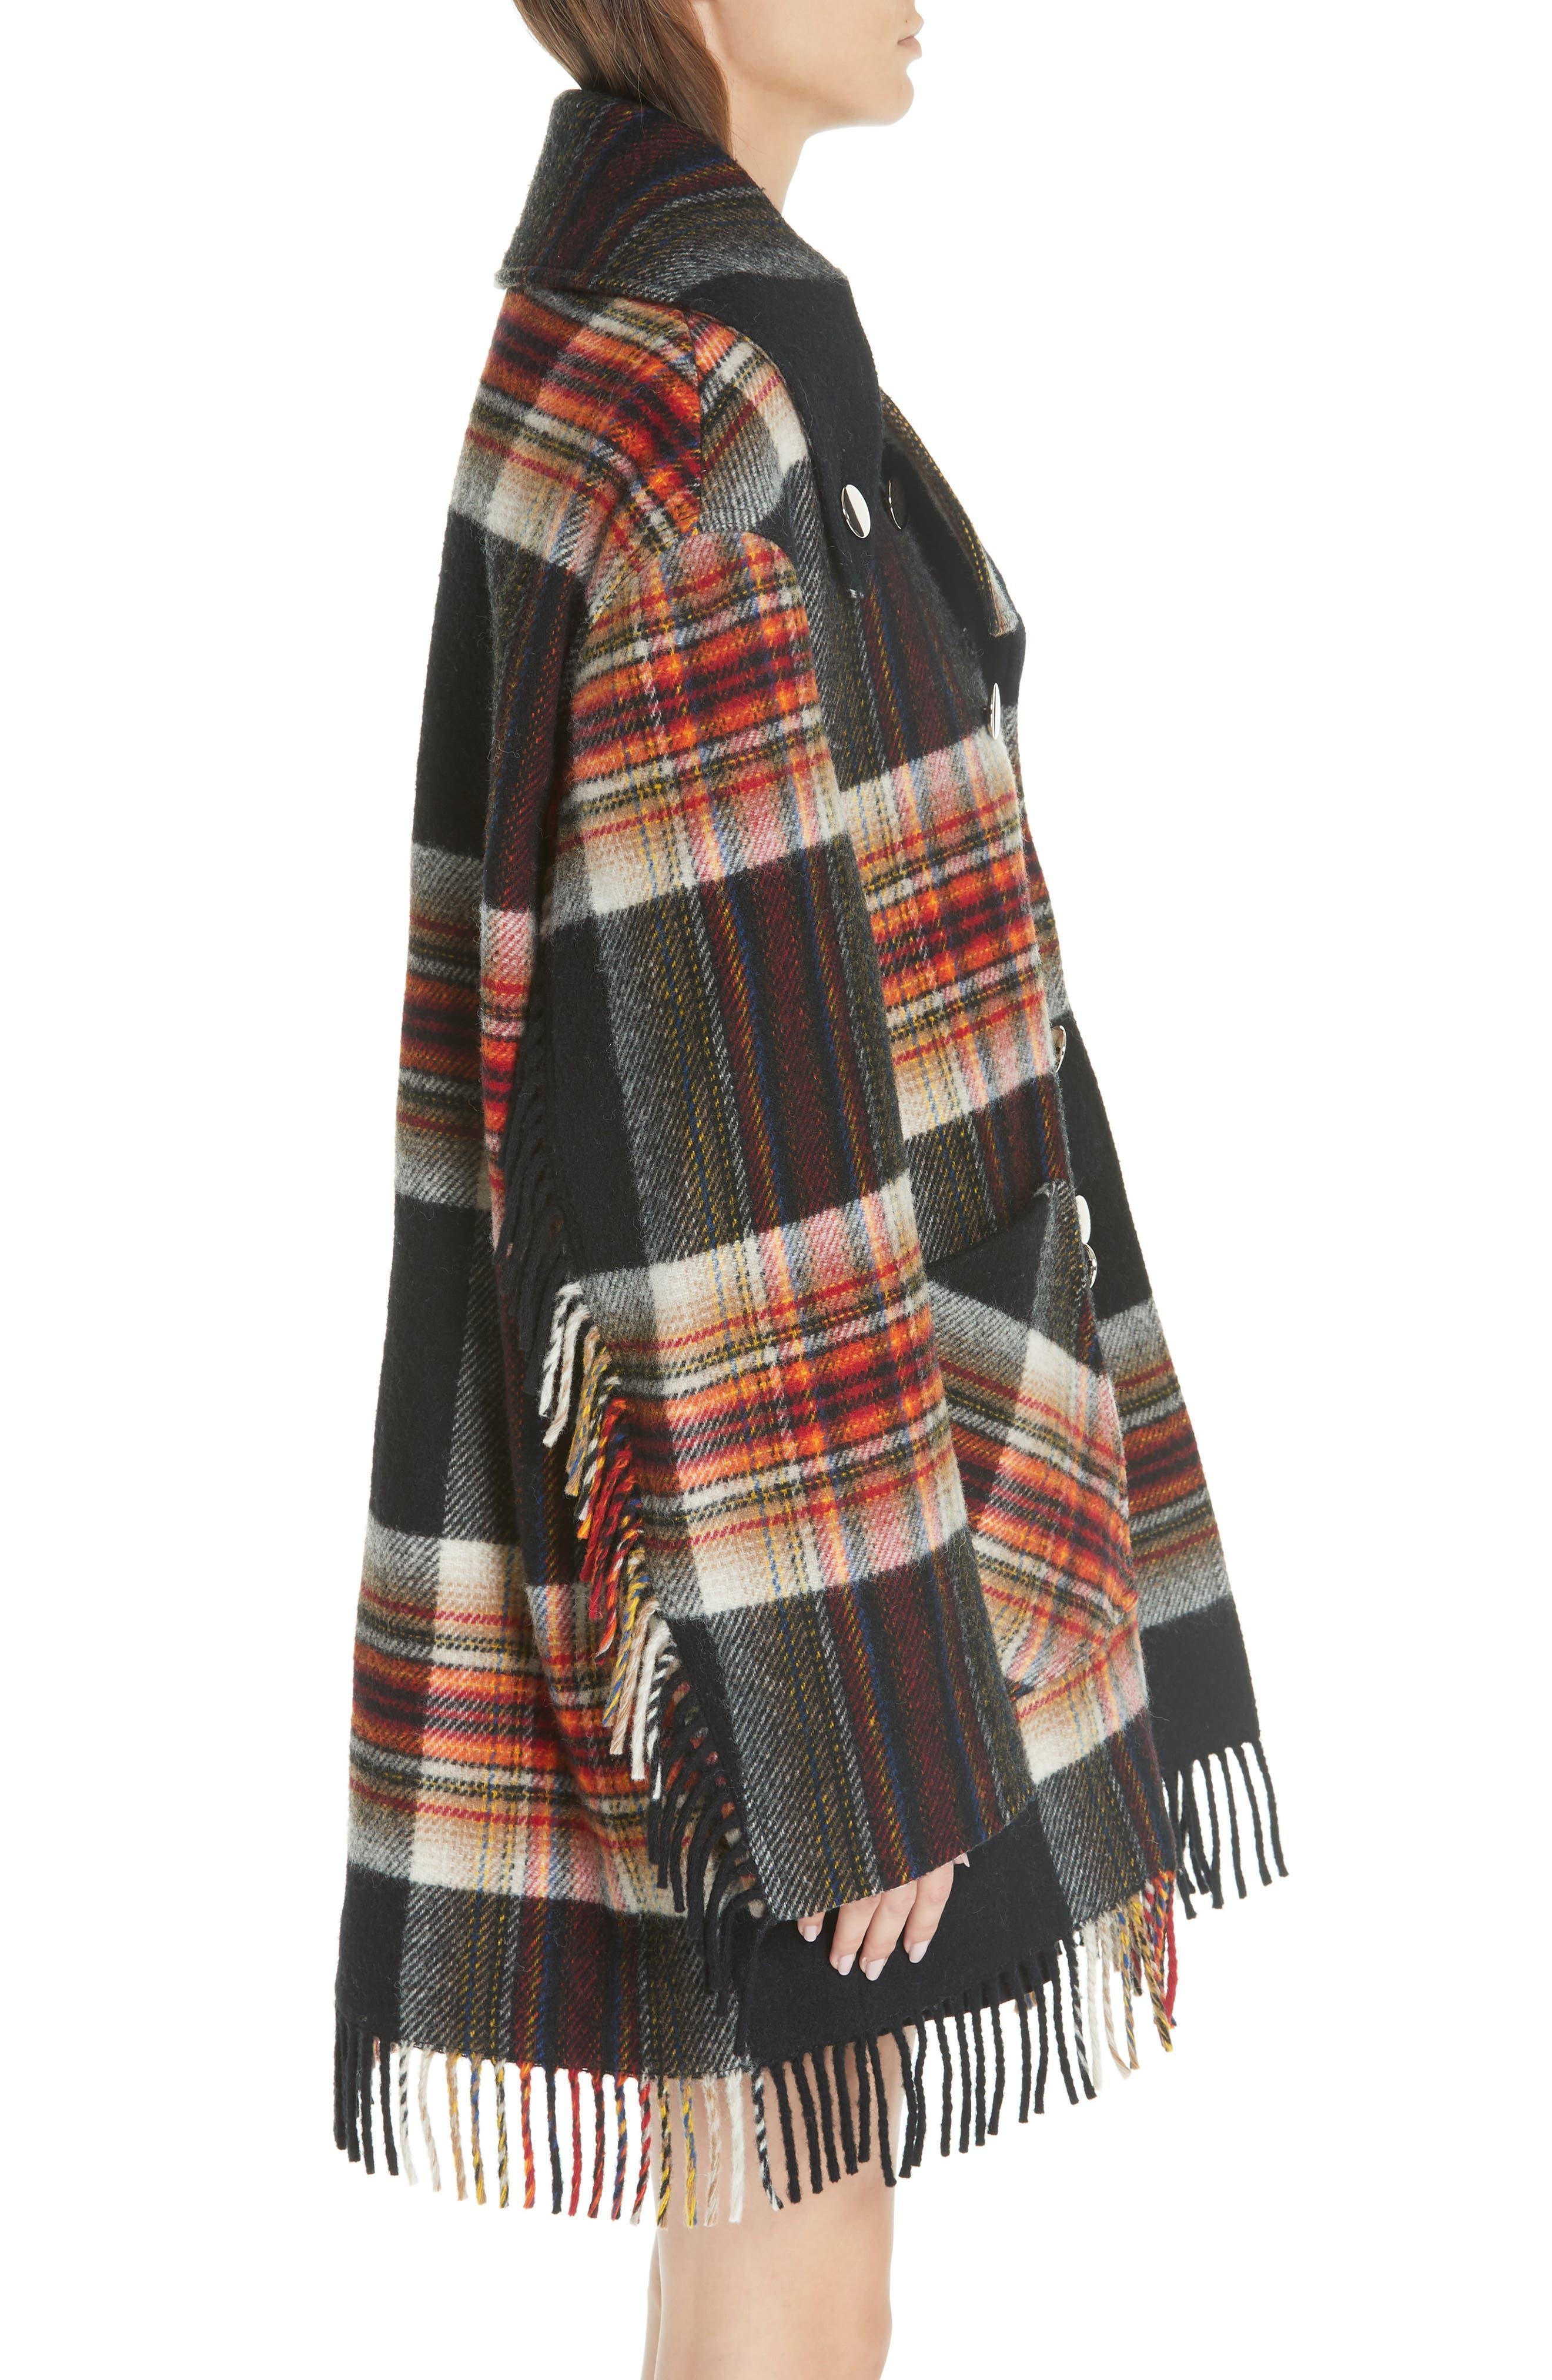 x Pendleton Fringe Plaid Blanket Coat,                             Alternate thumbnail 3, color,                             001